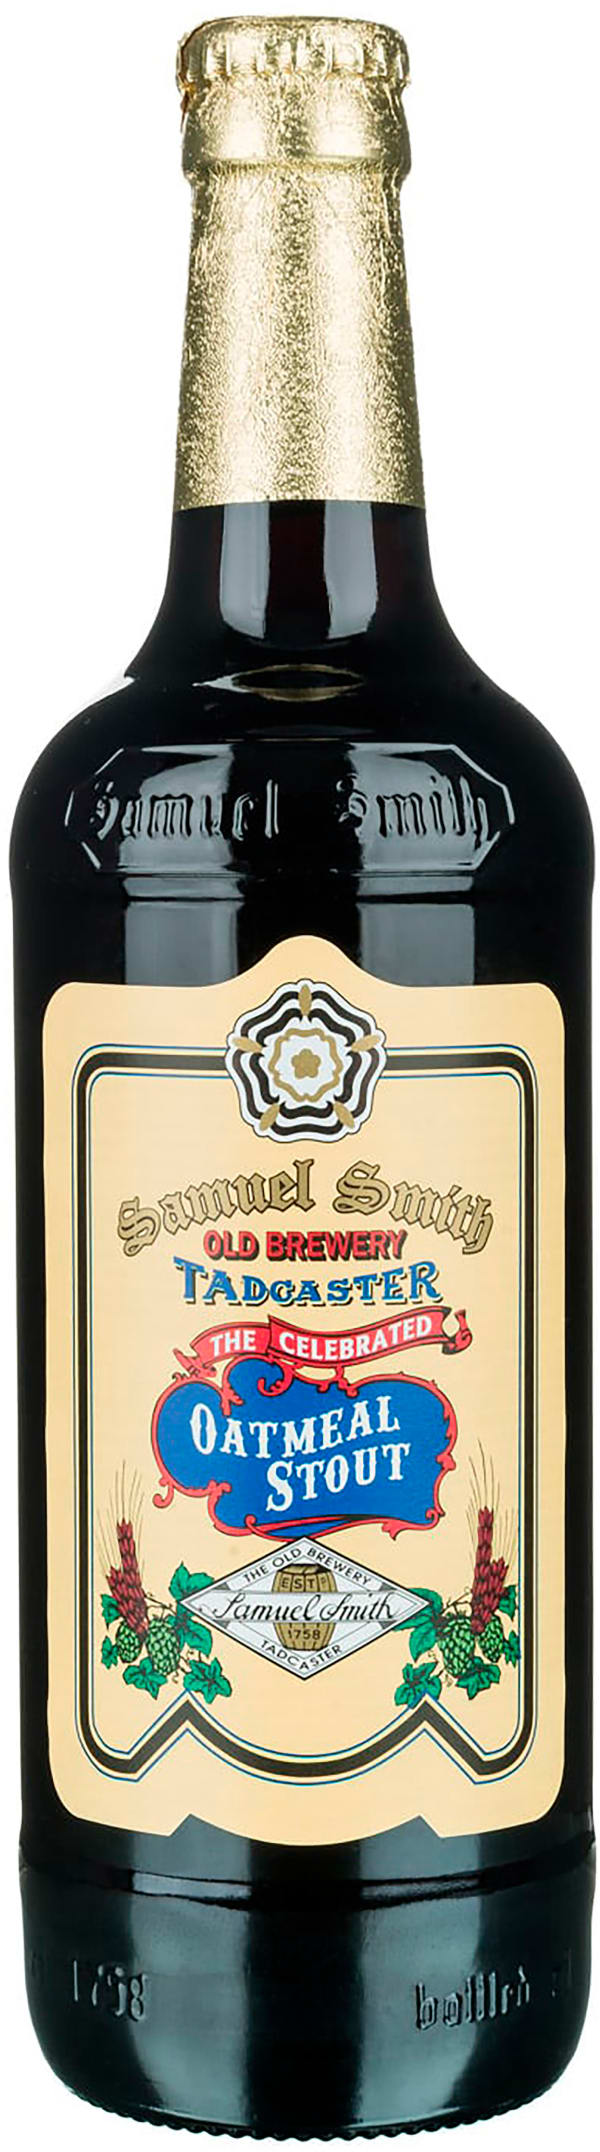 Samuel Smith Oatmeal Stout